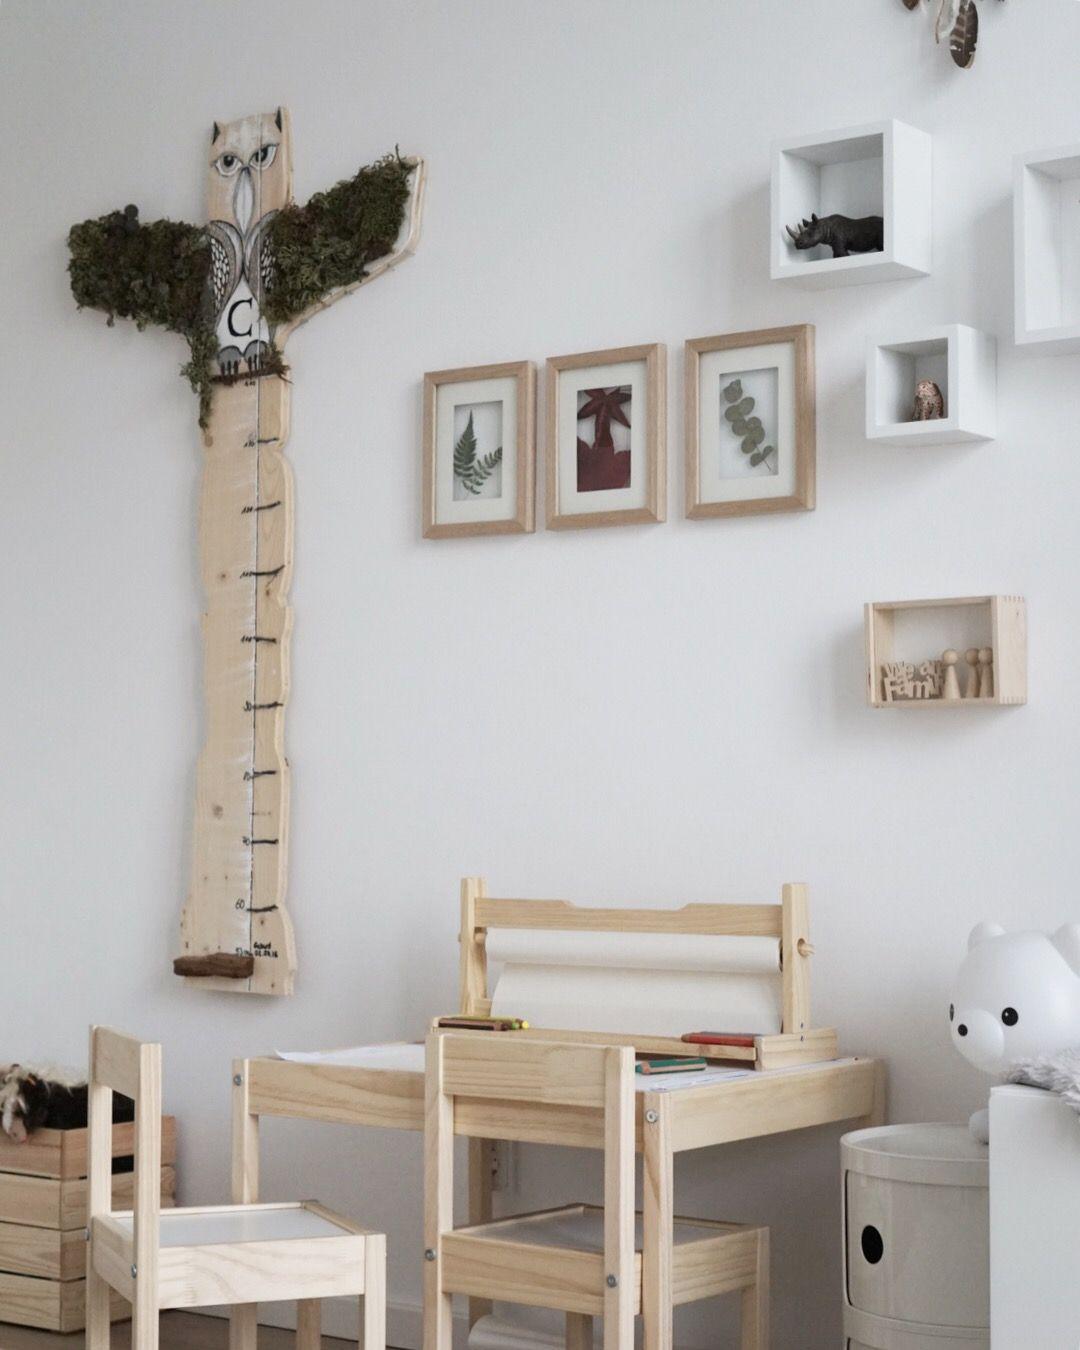 Kinderzimmer malen malplatz Ikea Holz Natur Mädchenzimmer